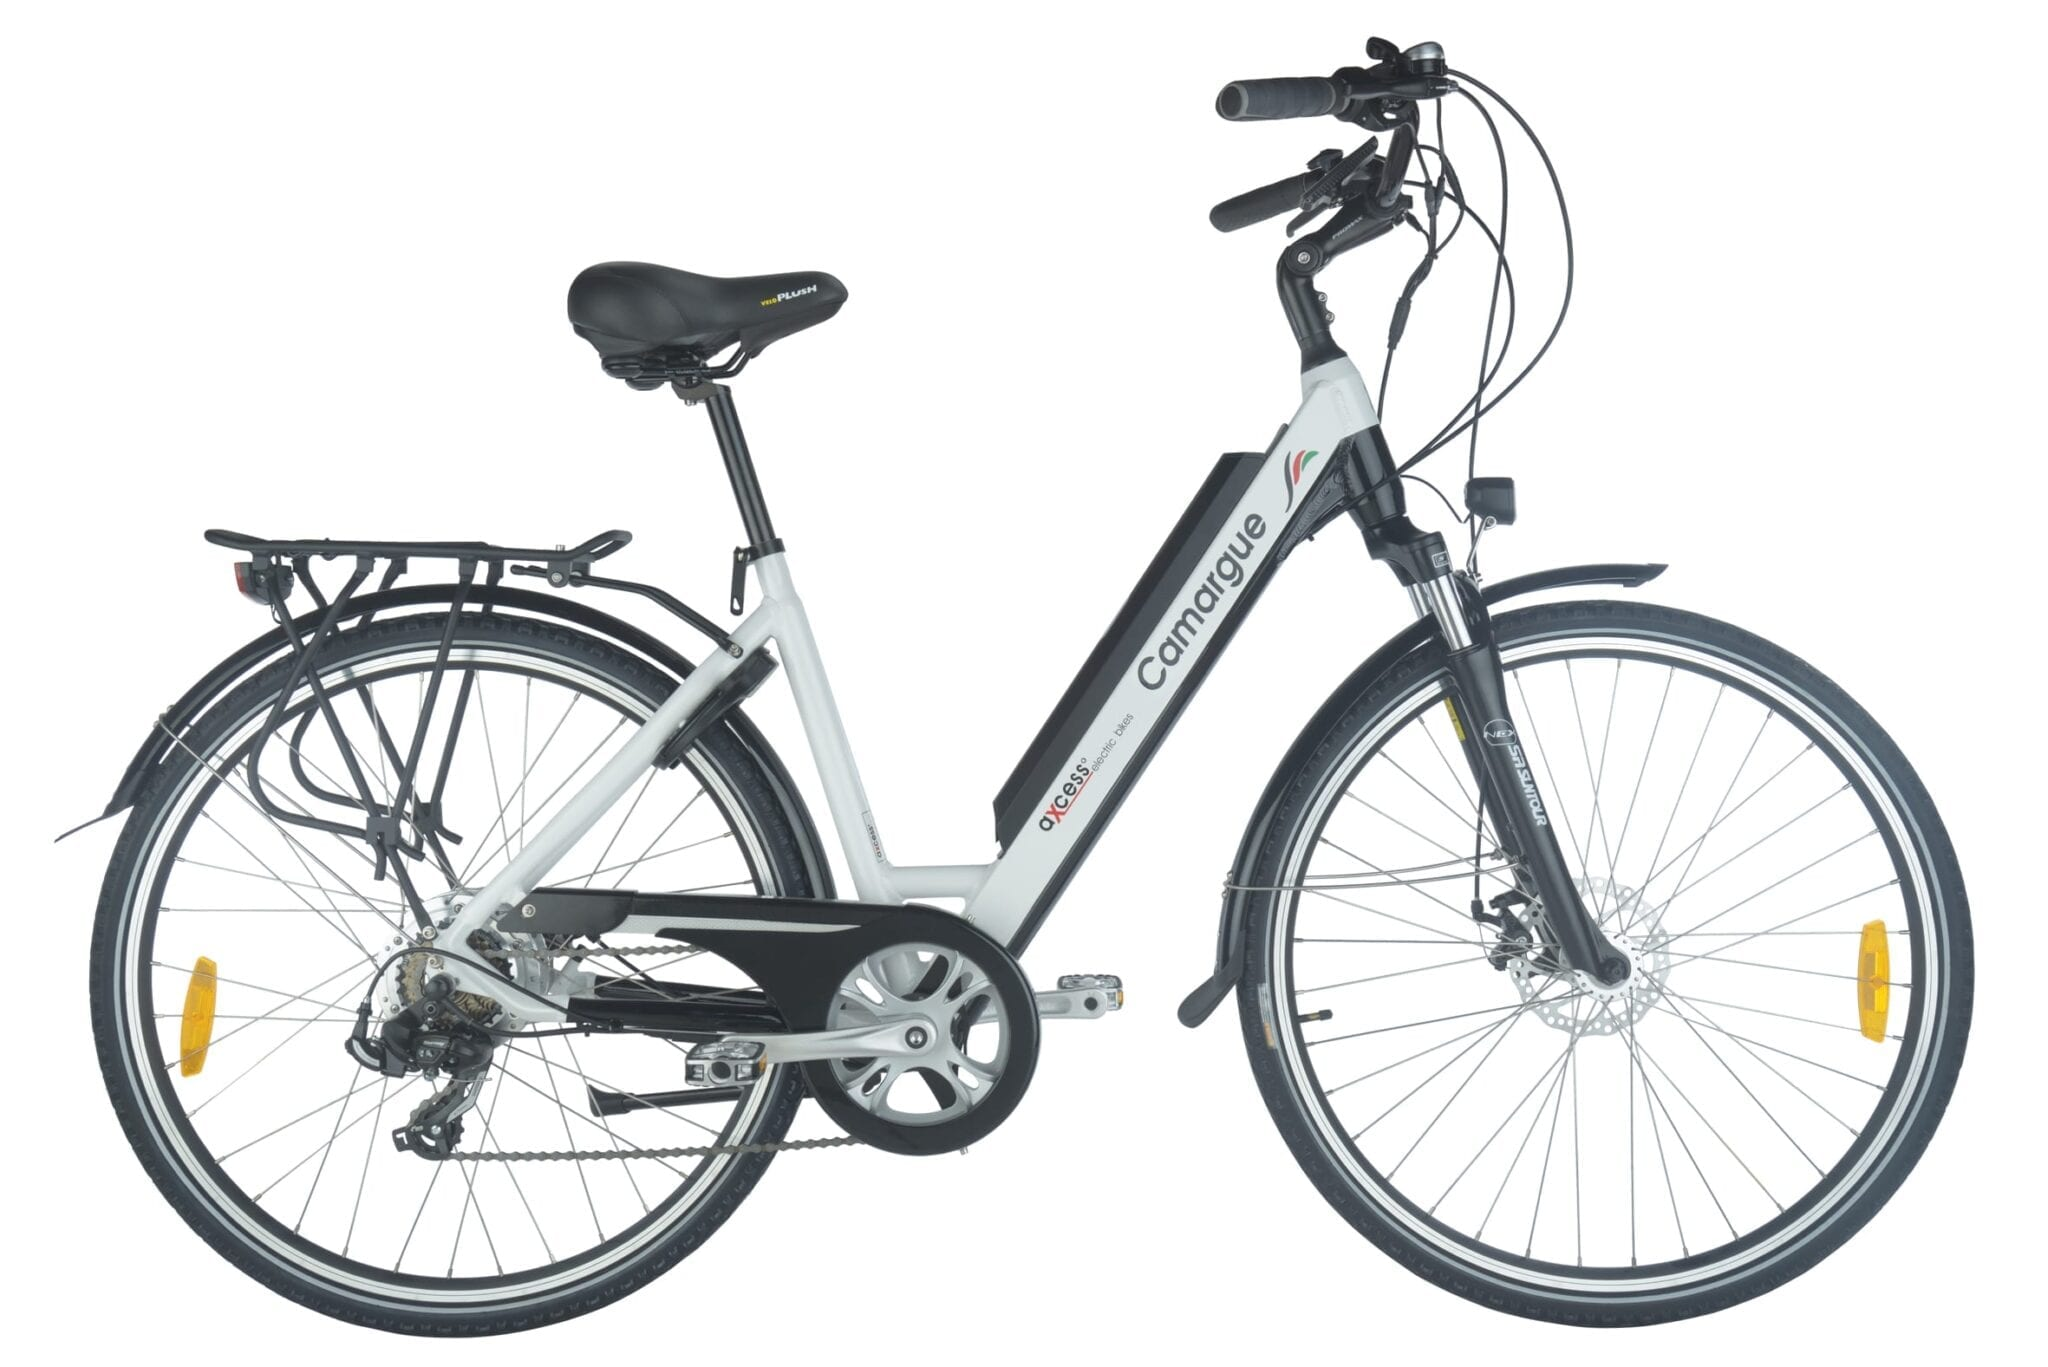 Axcess 2 Camargue Electric Bike